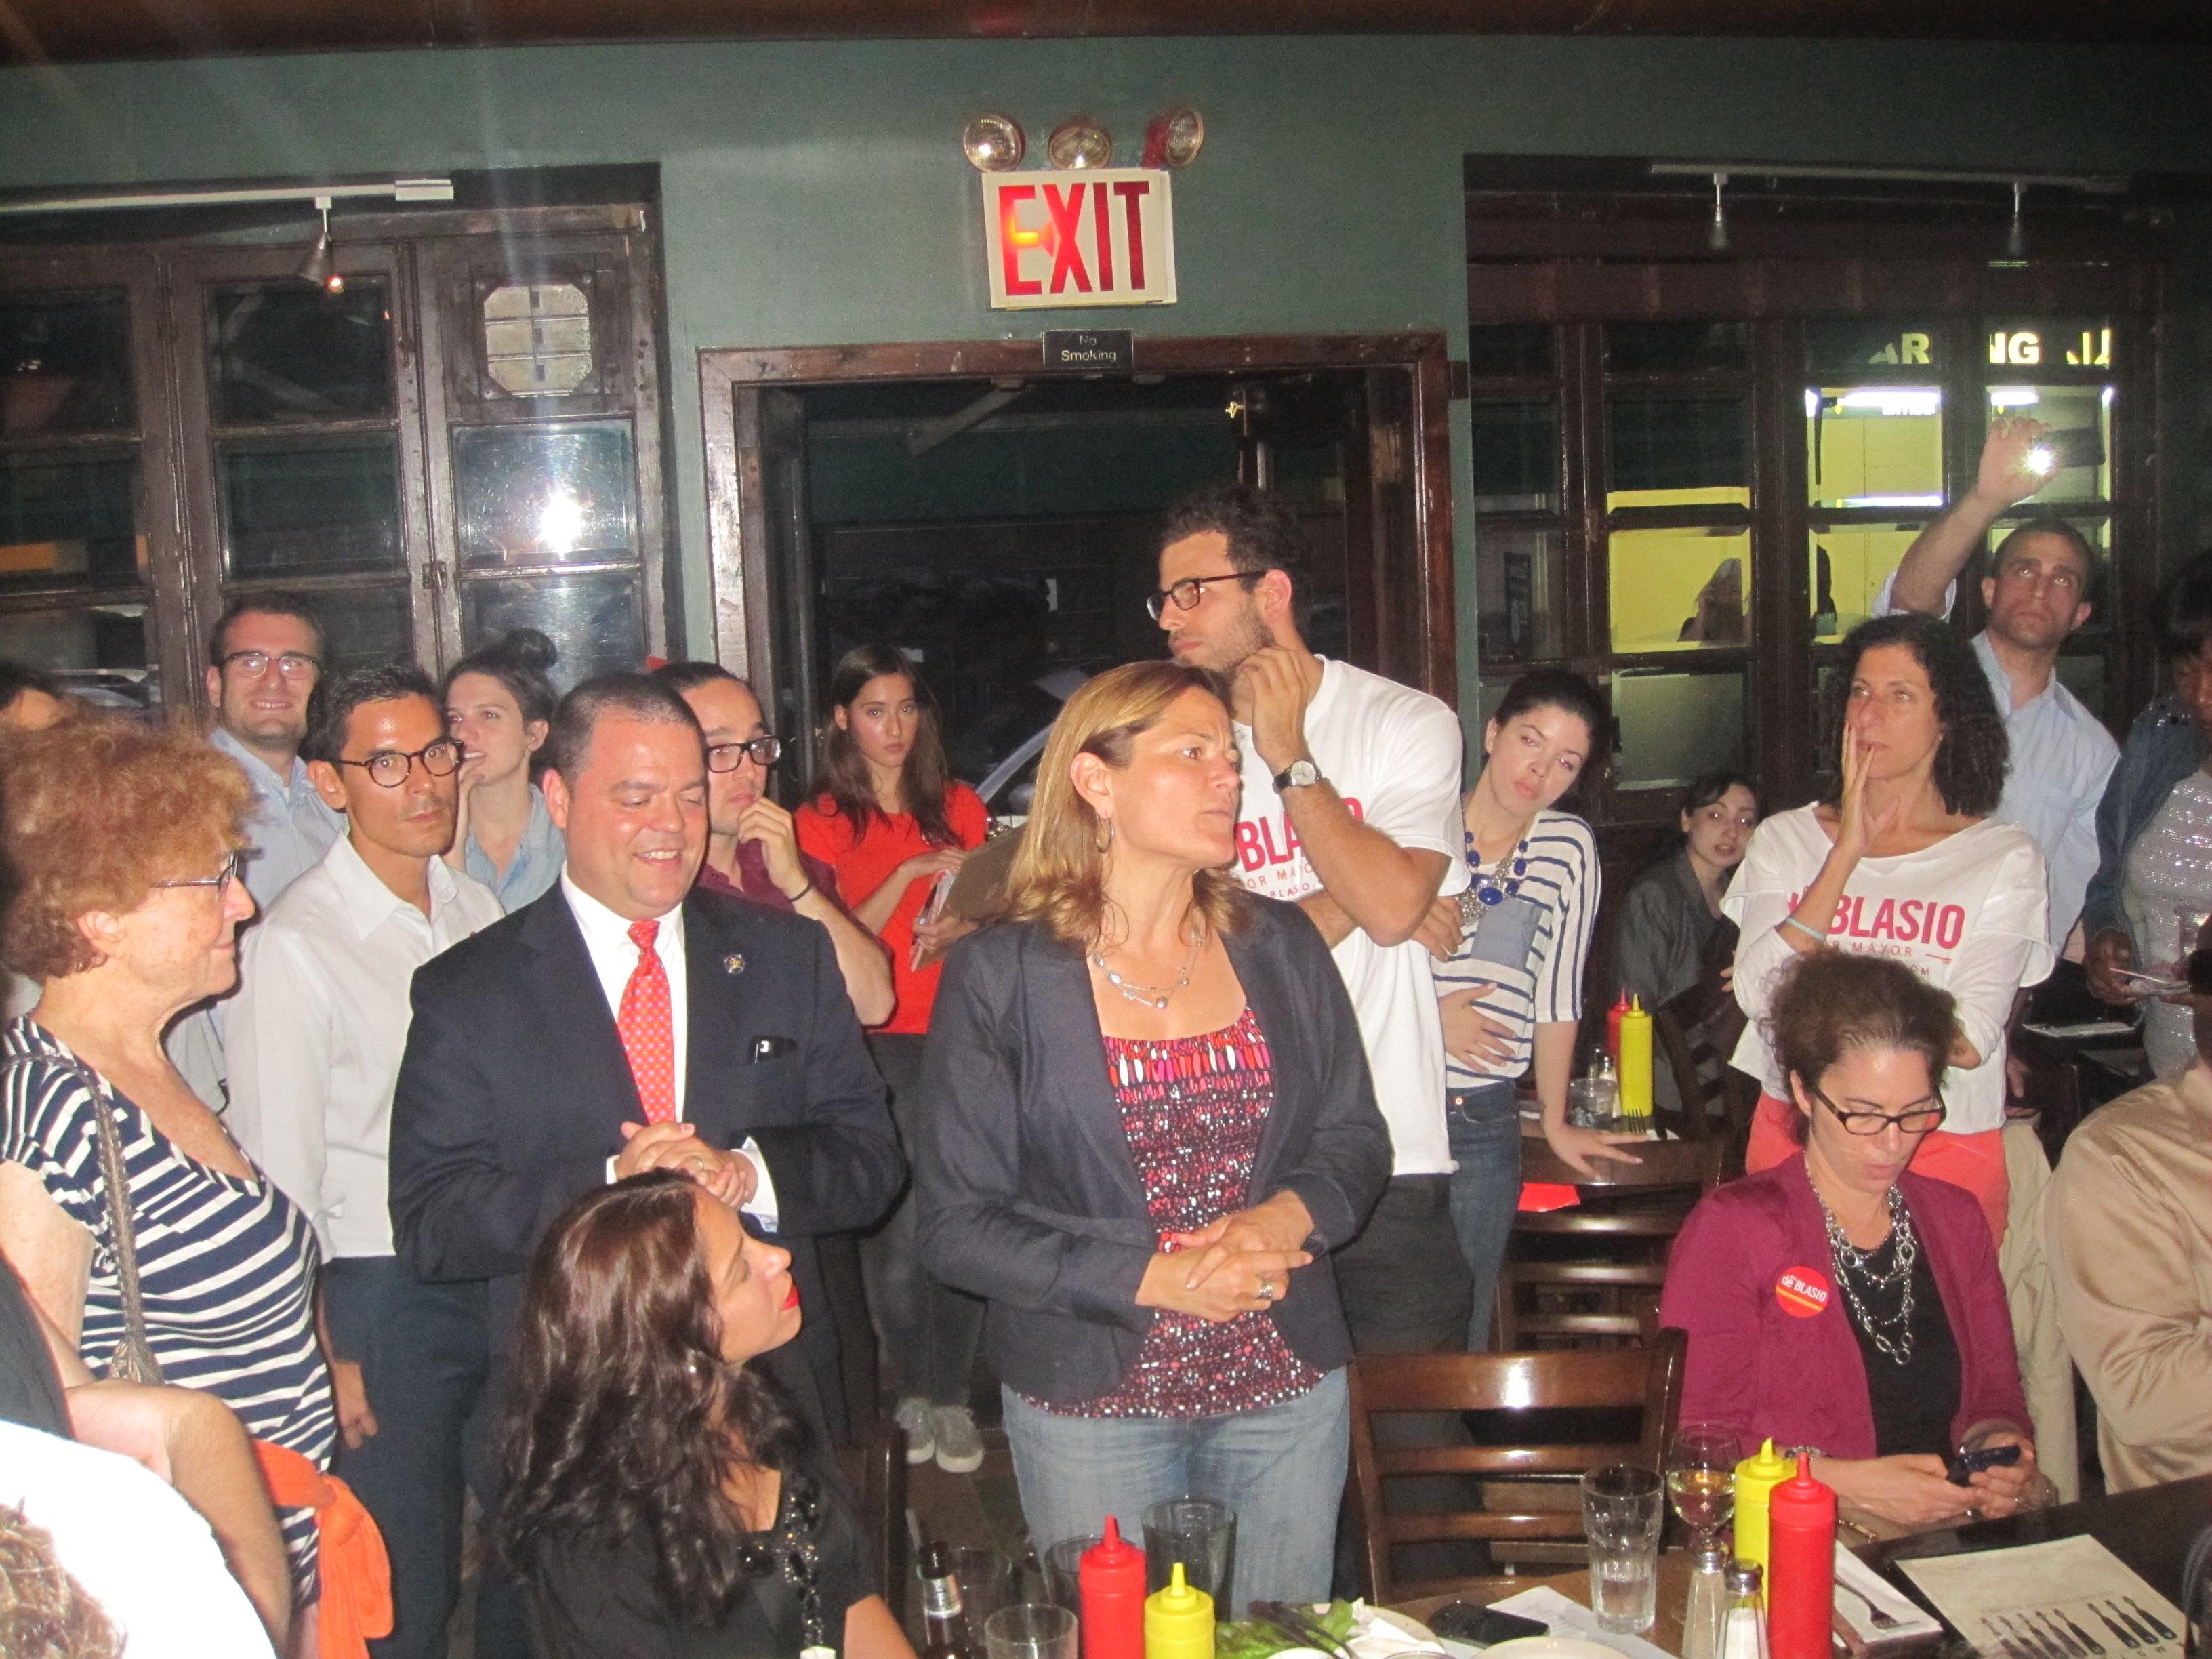 City Councilwoman Melissa Mark-Viverito at the Bill de Blasio watch party.